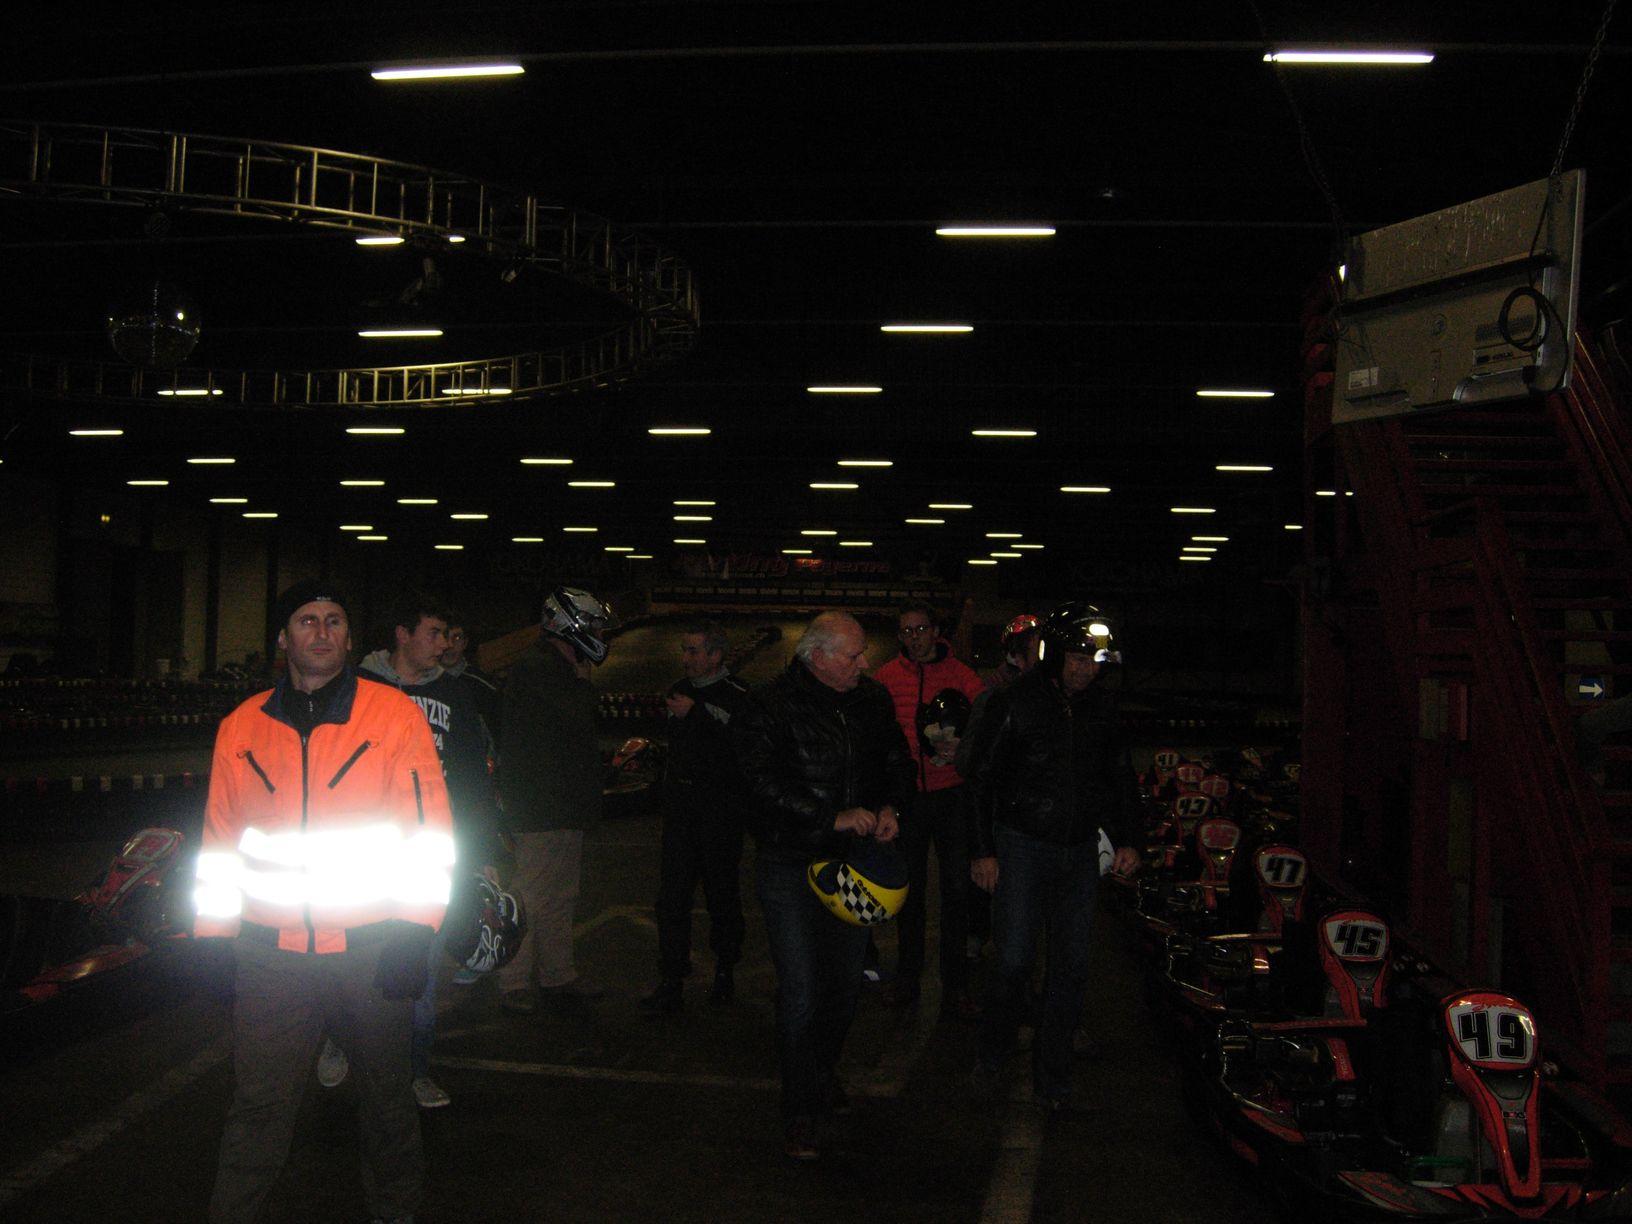 20141206_Karting-009.JPG